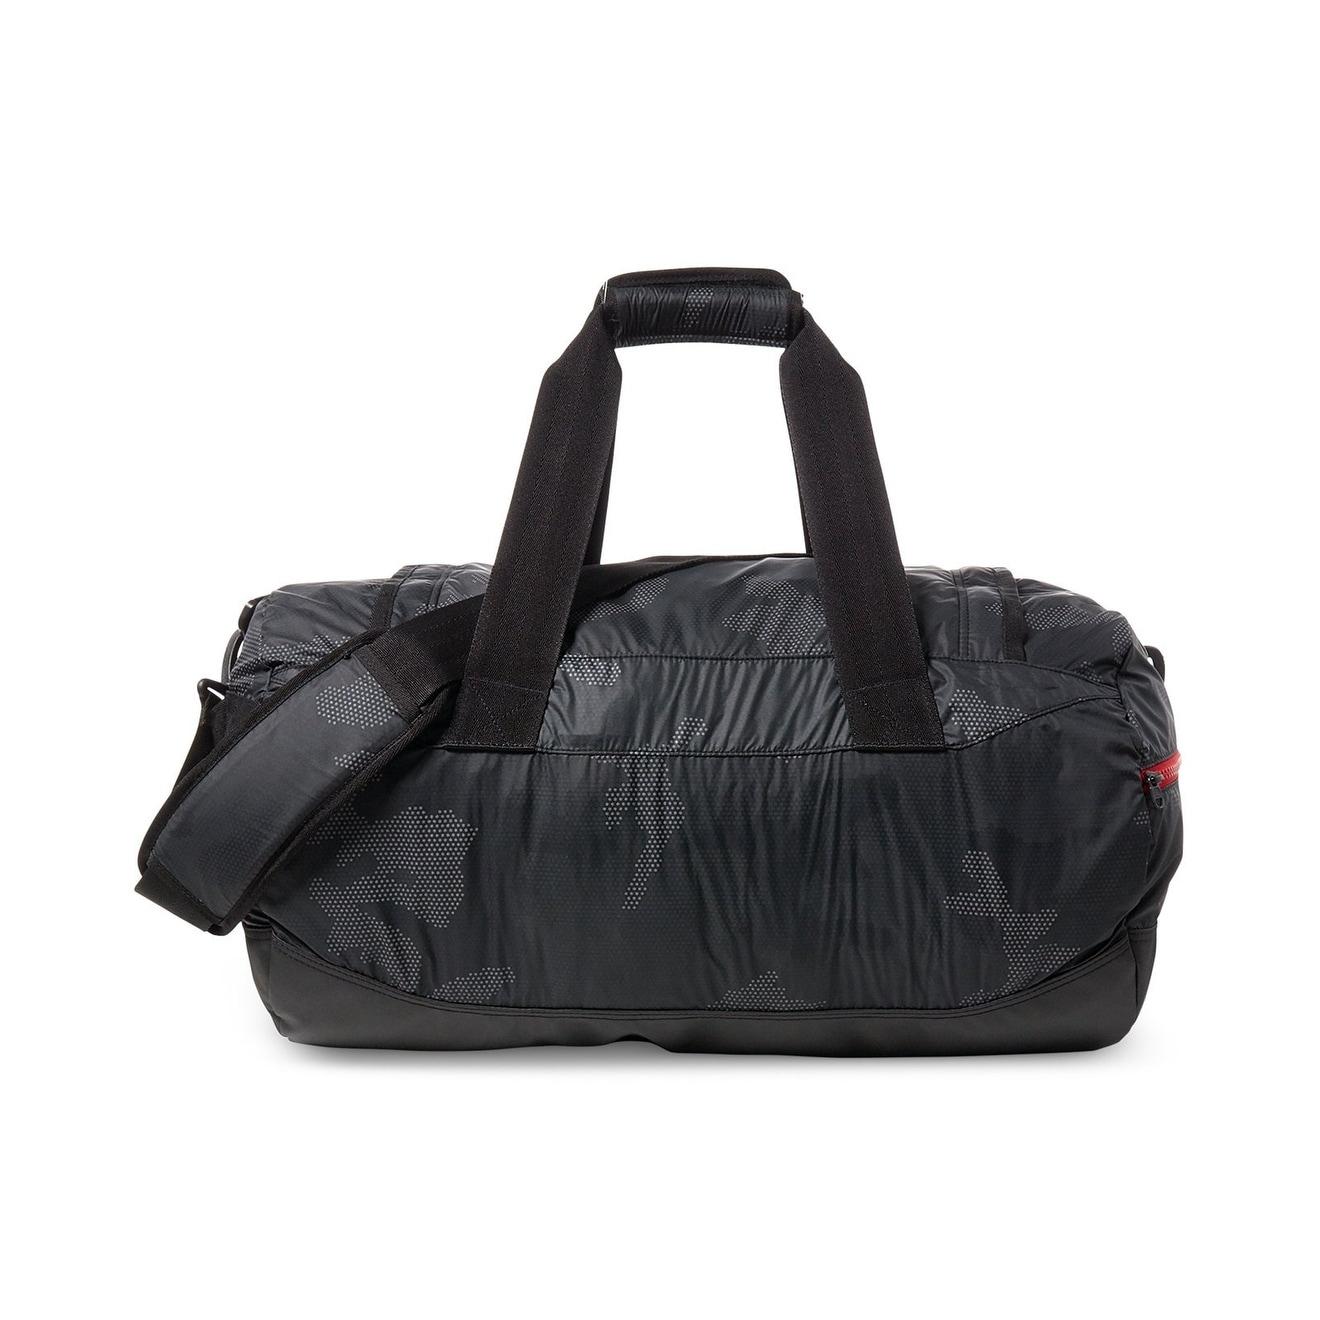 f519e384f2c3 Shop Polo Ralph Lauren NEW Black Men s Nylon Large Double Zip Duffle Bag -  Free Shipping Today - Overstock - 20415414